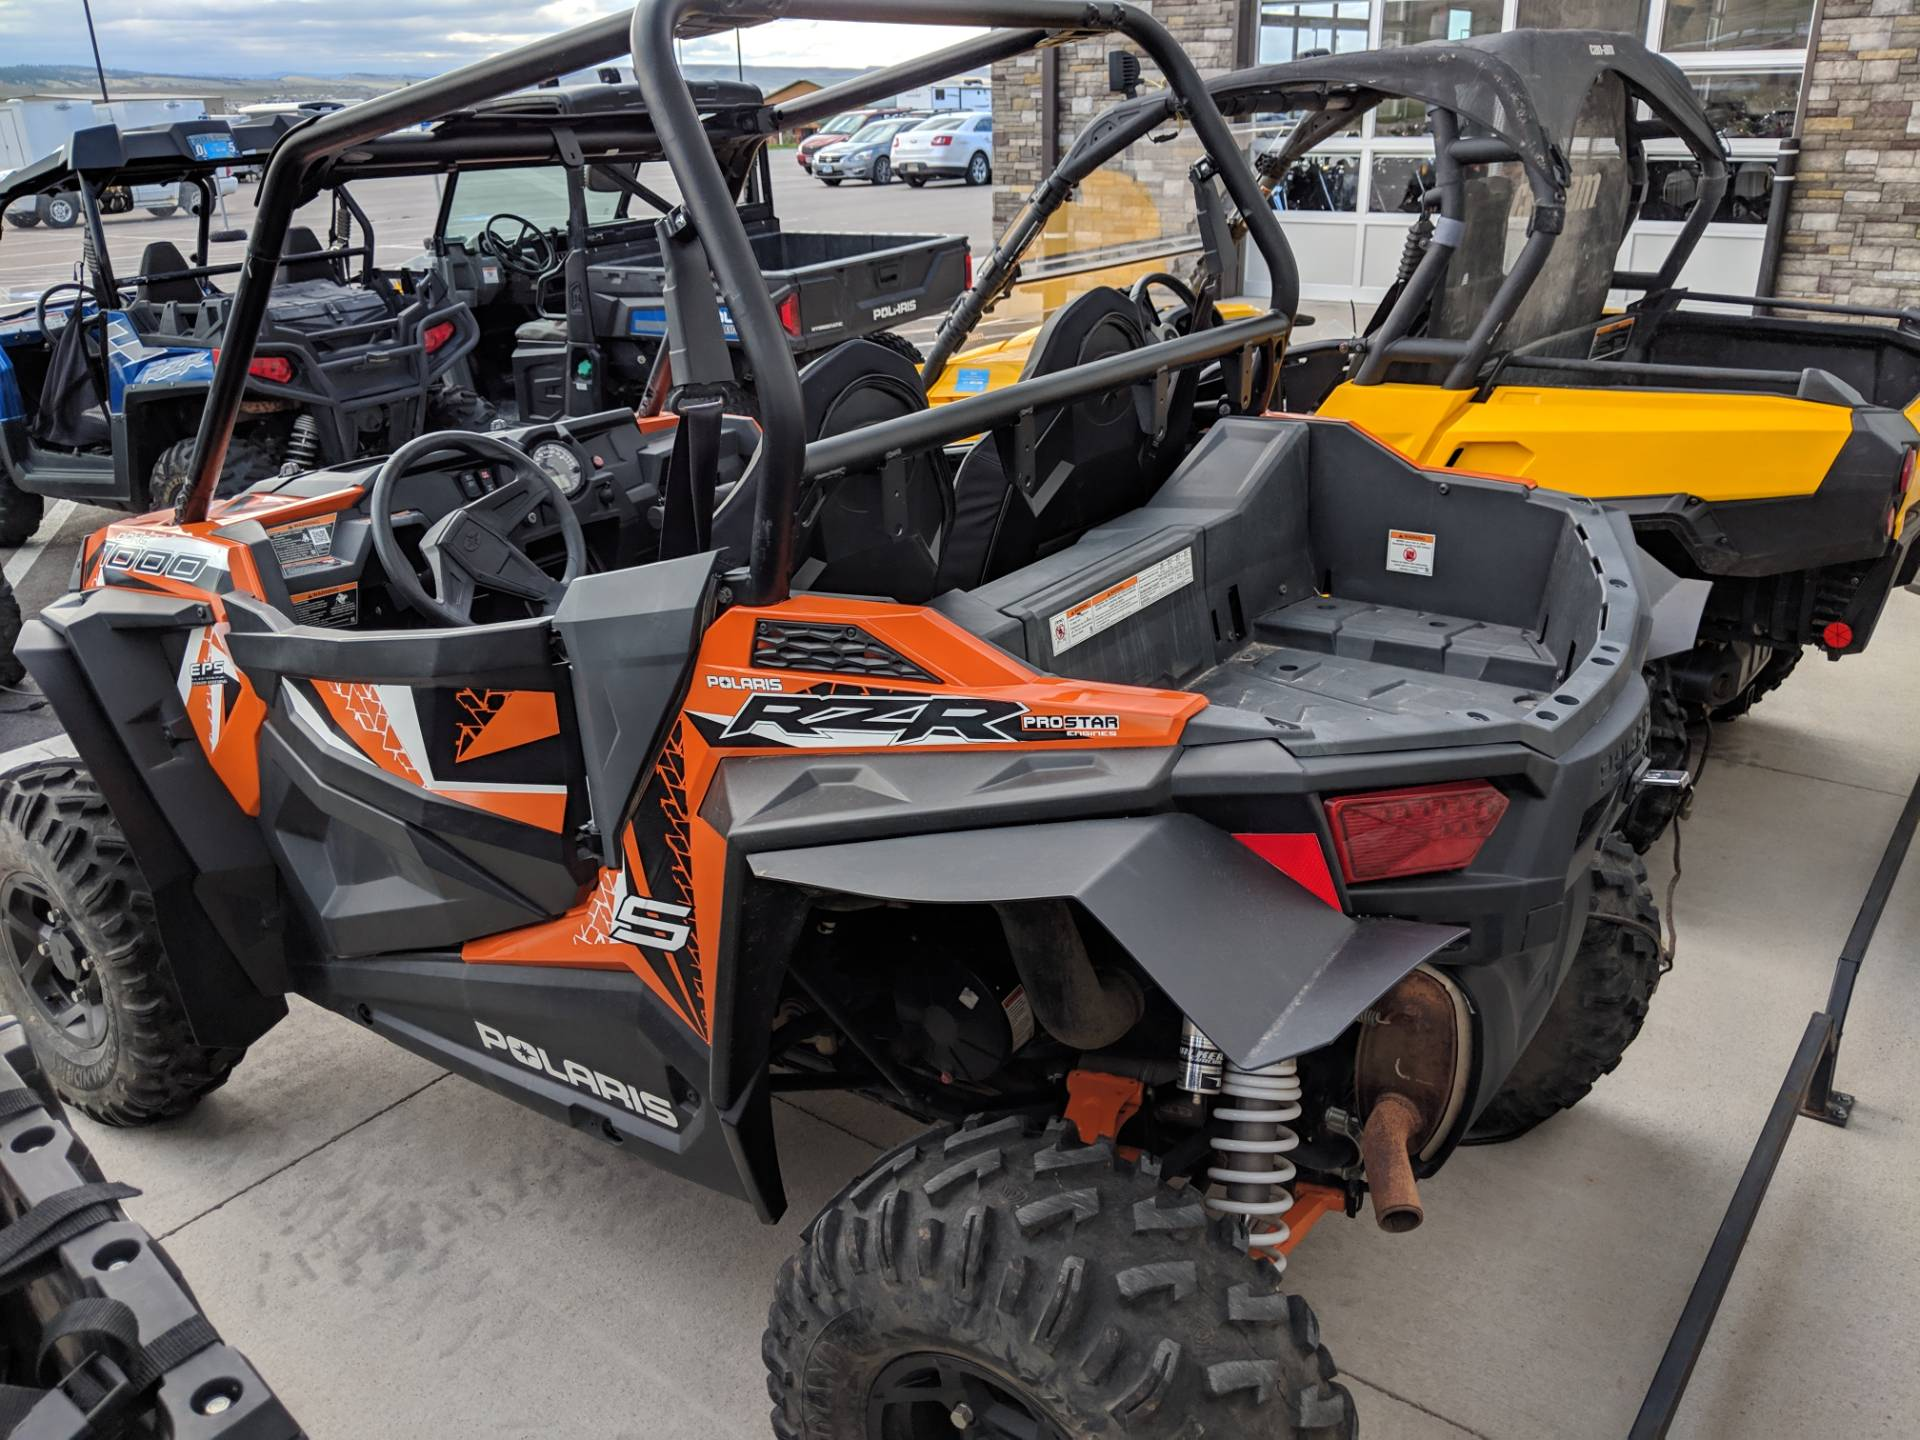 2017 Polaris RZR S 1000 EPS in Rapid City, South Dakota